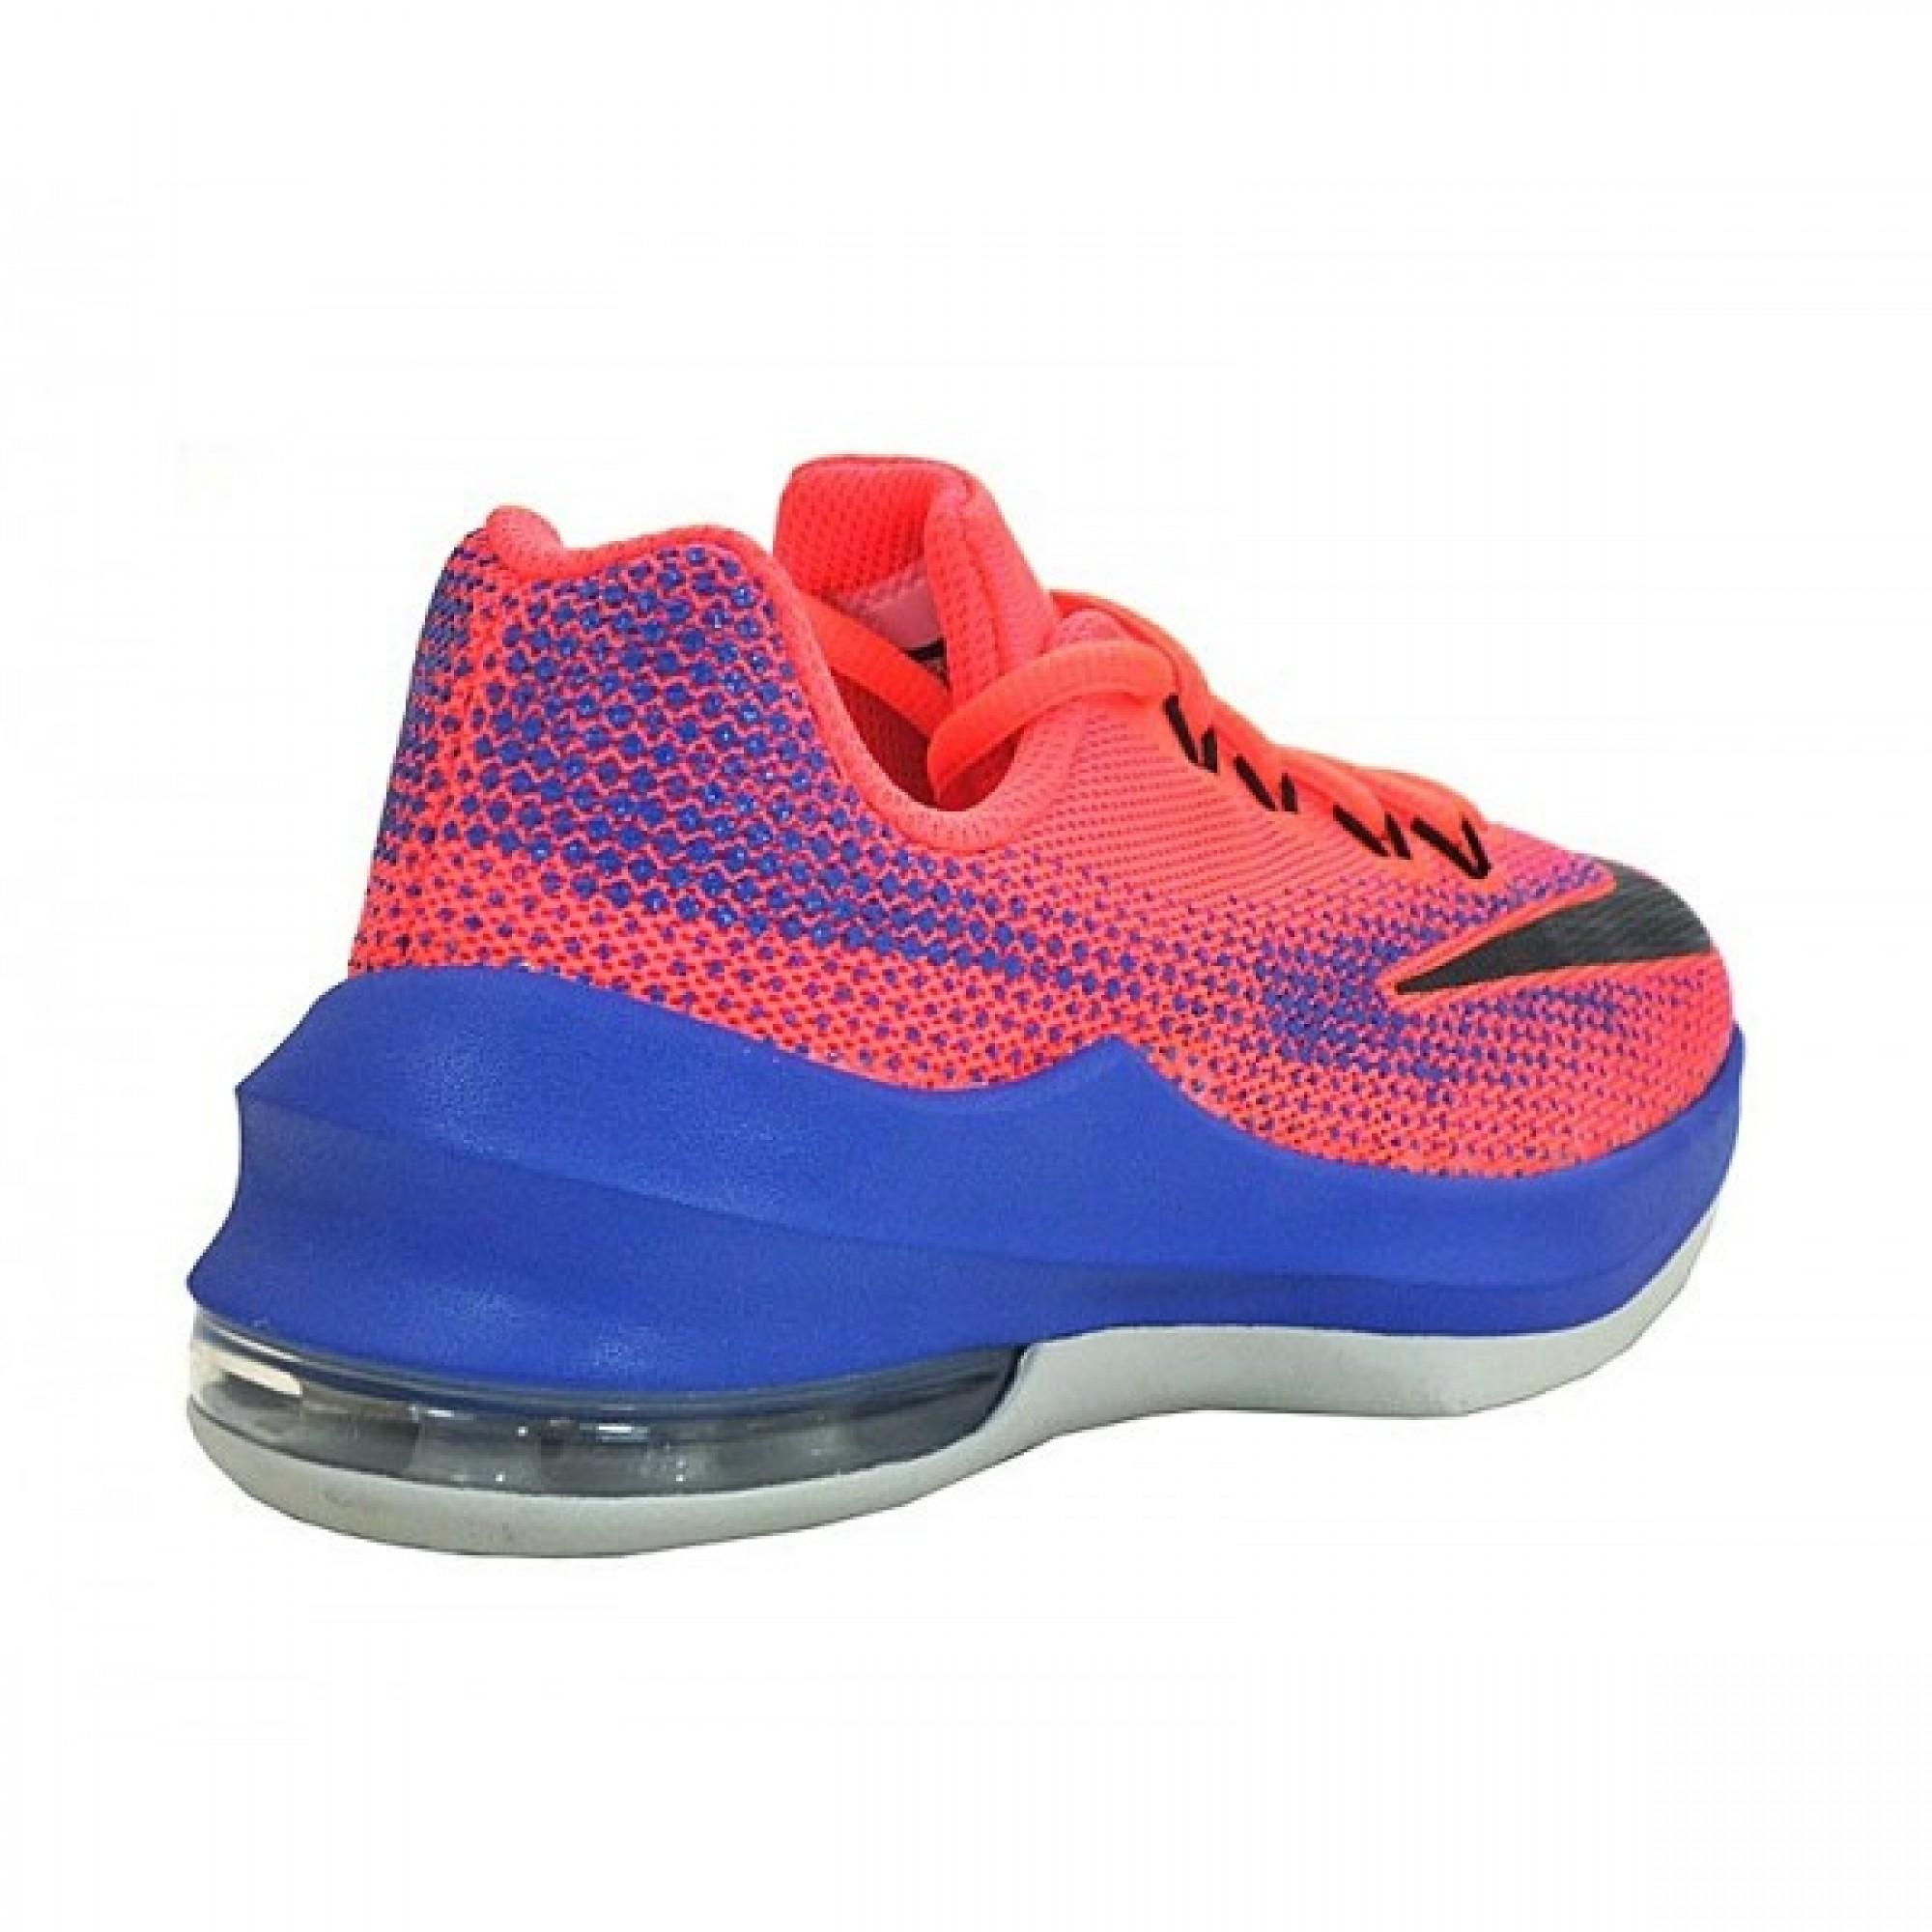 08aabcb49e9 Kids Nike Air Max Infuriate Low 869991-800 Παιδικό Μπλε - Πορτοκαλί